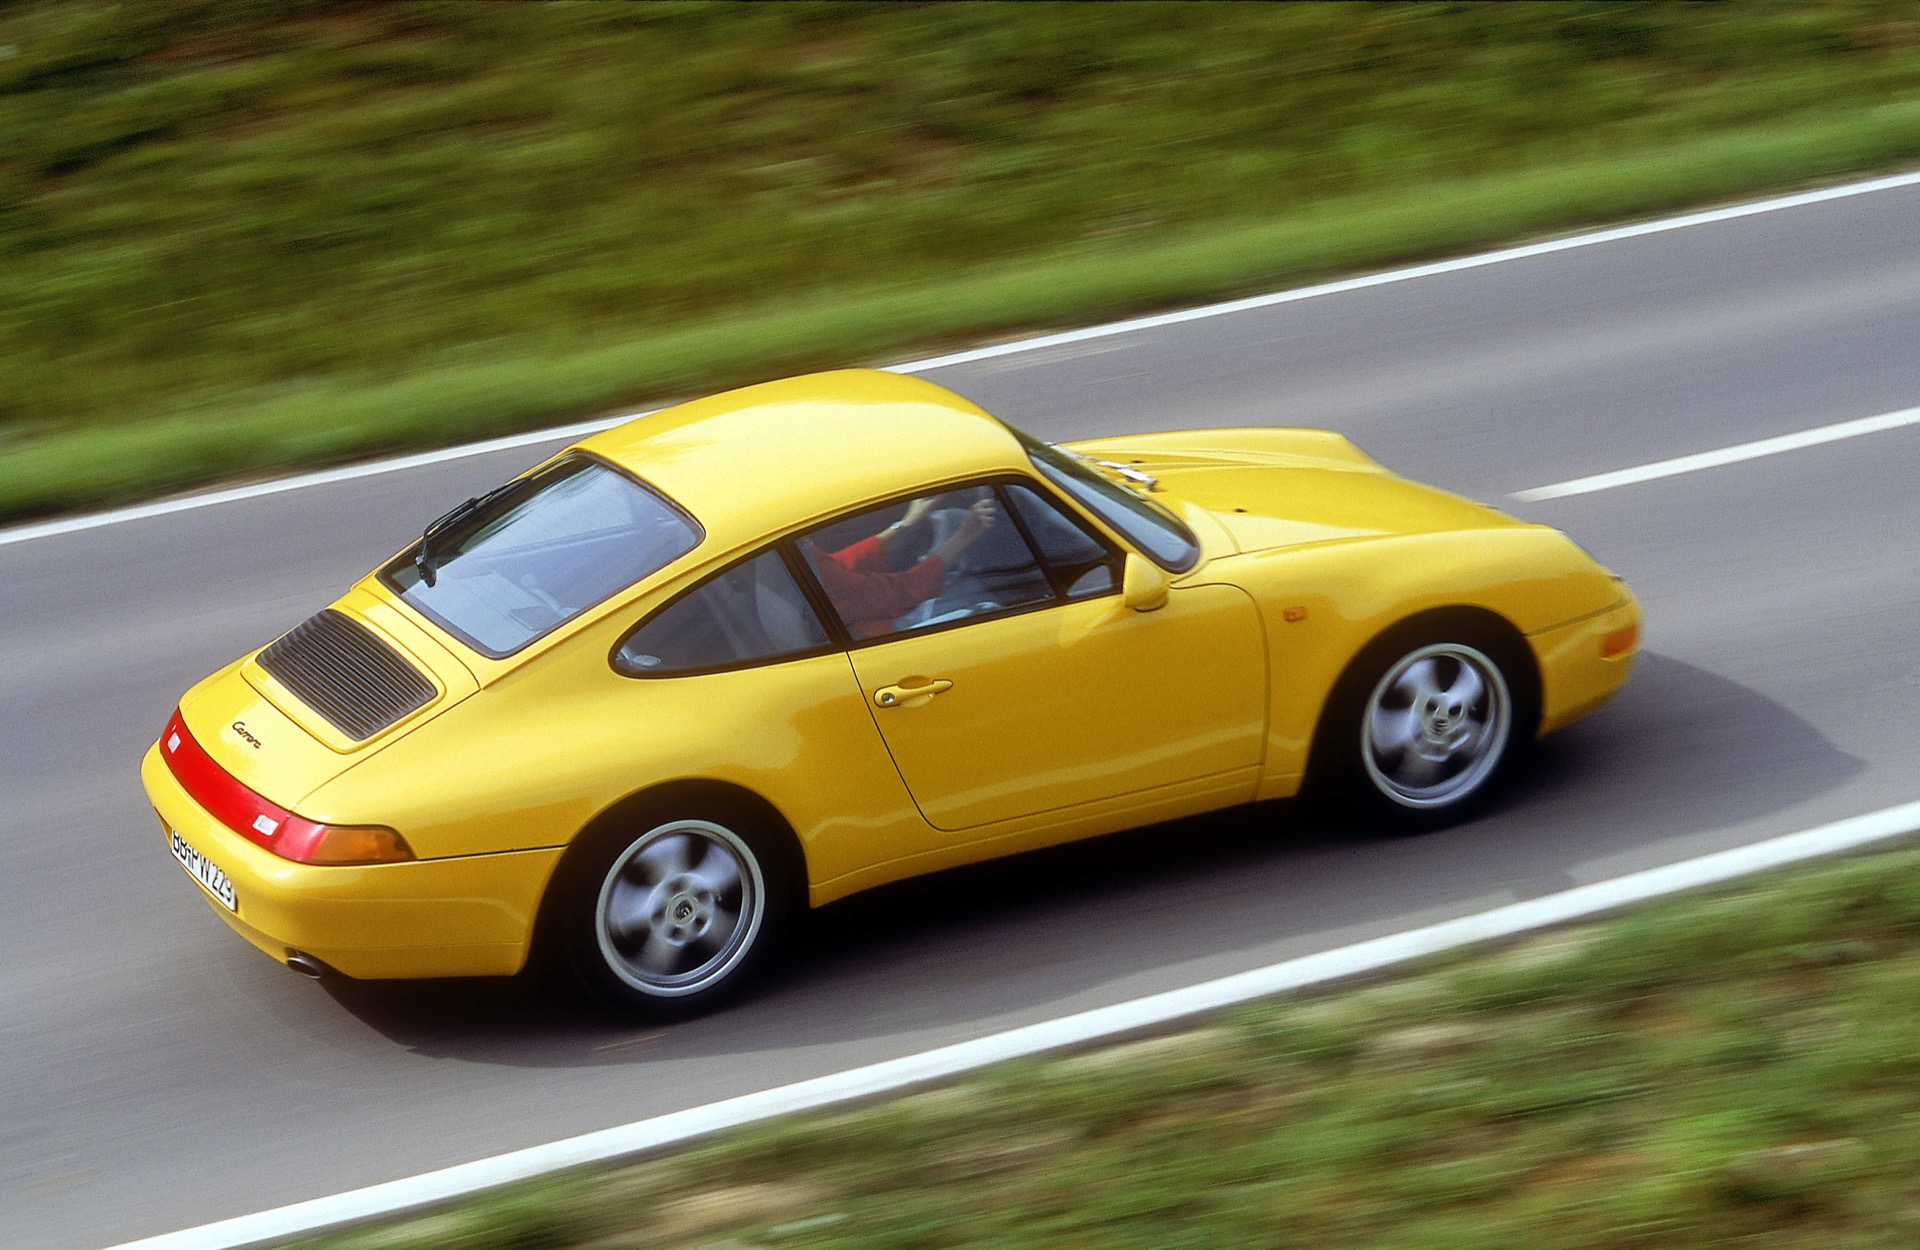 1994, 911 Carrrea Coupé, Typ 993, 3,6 Liter, Generationen